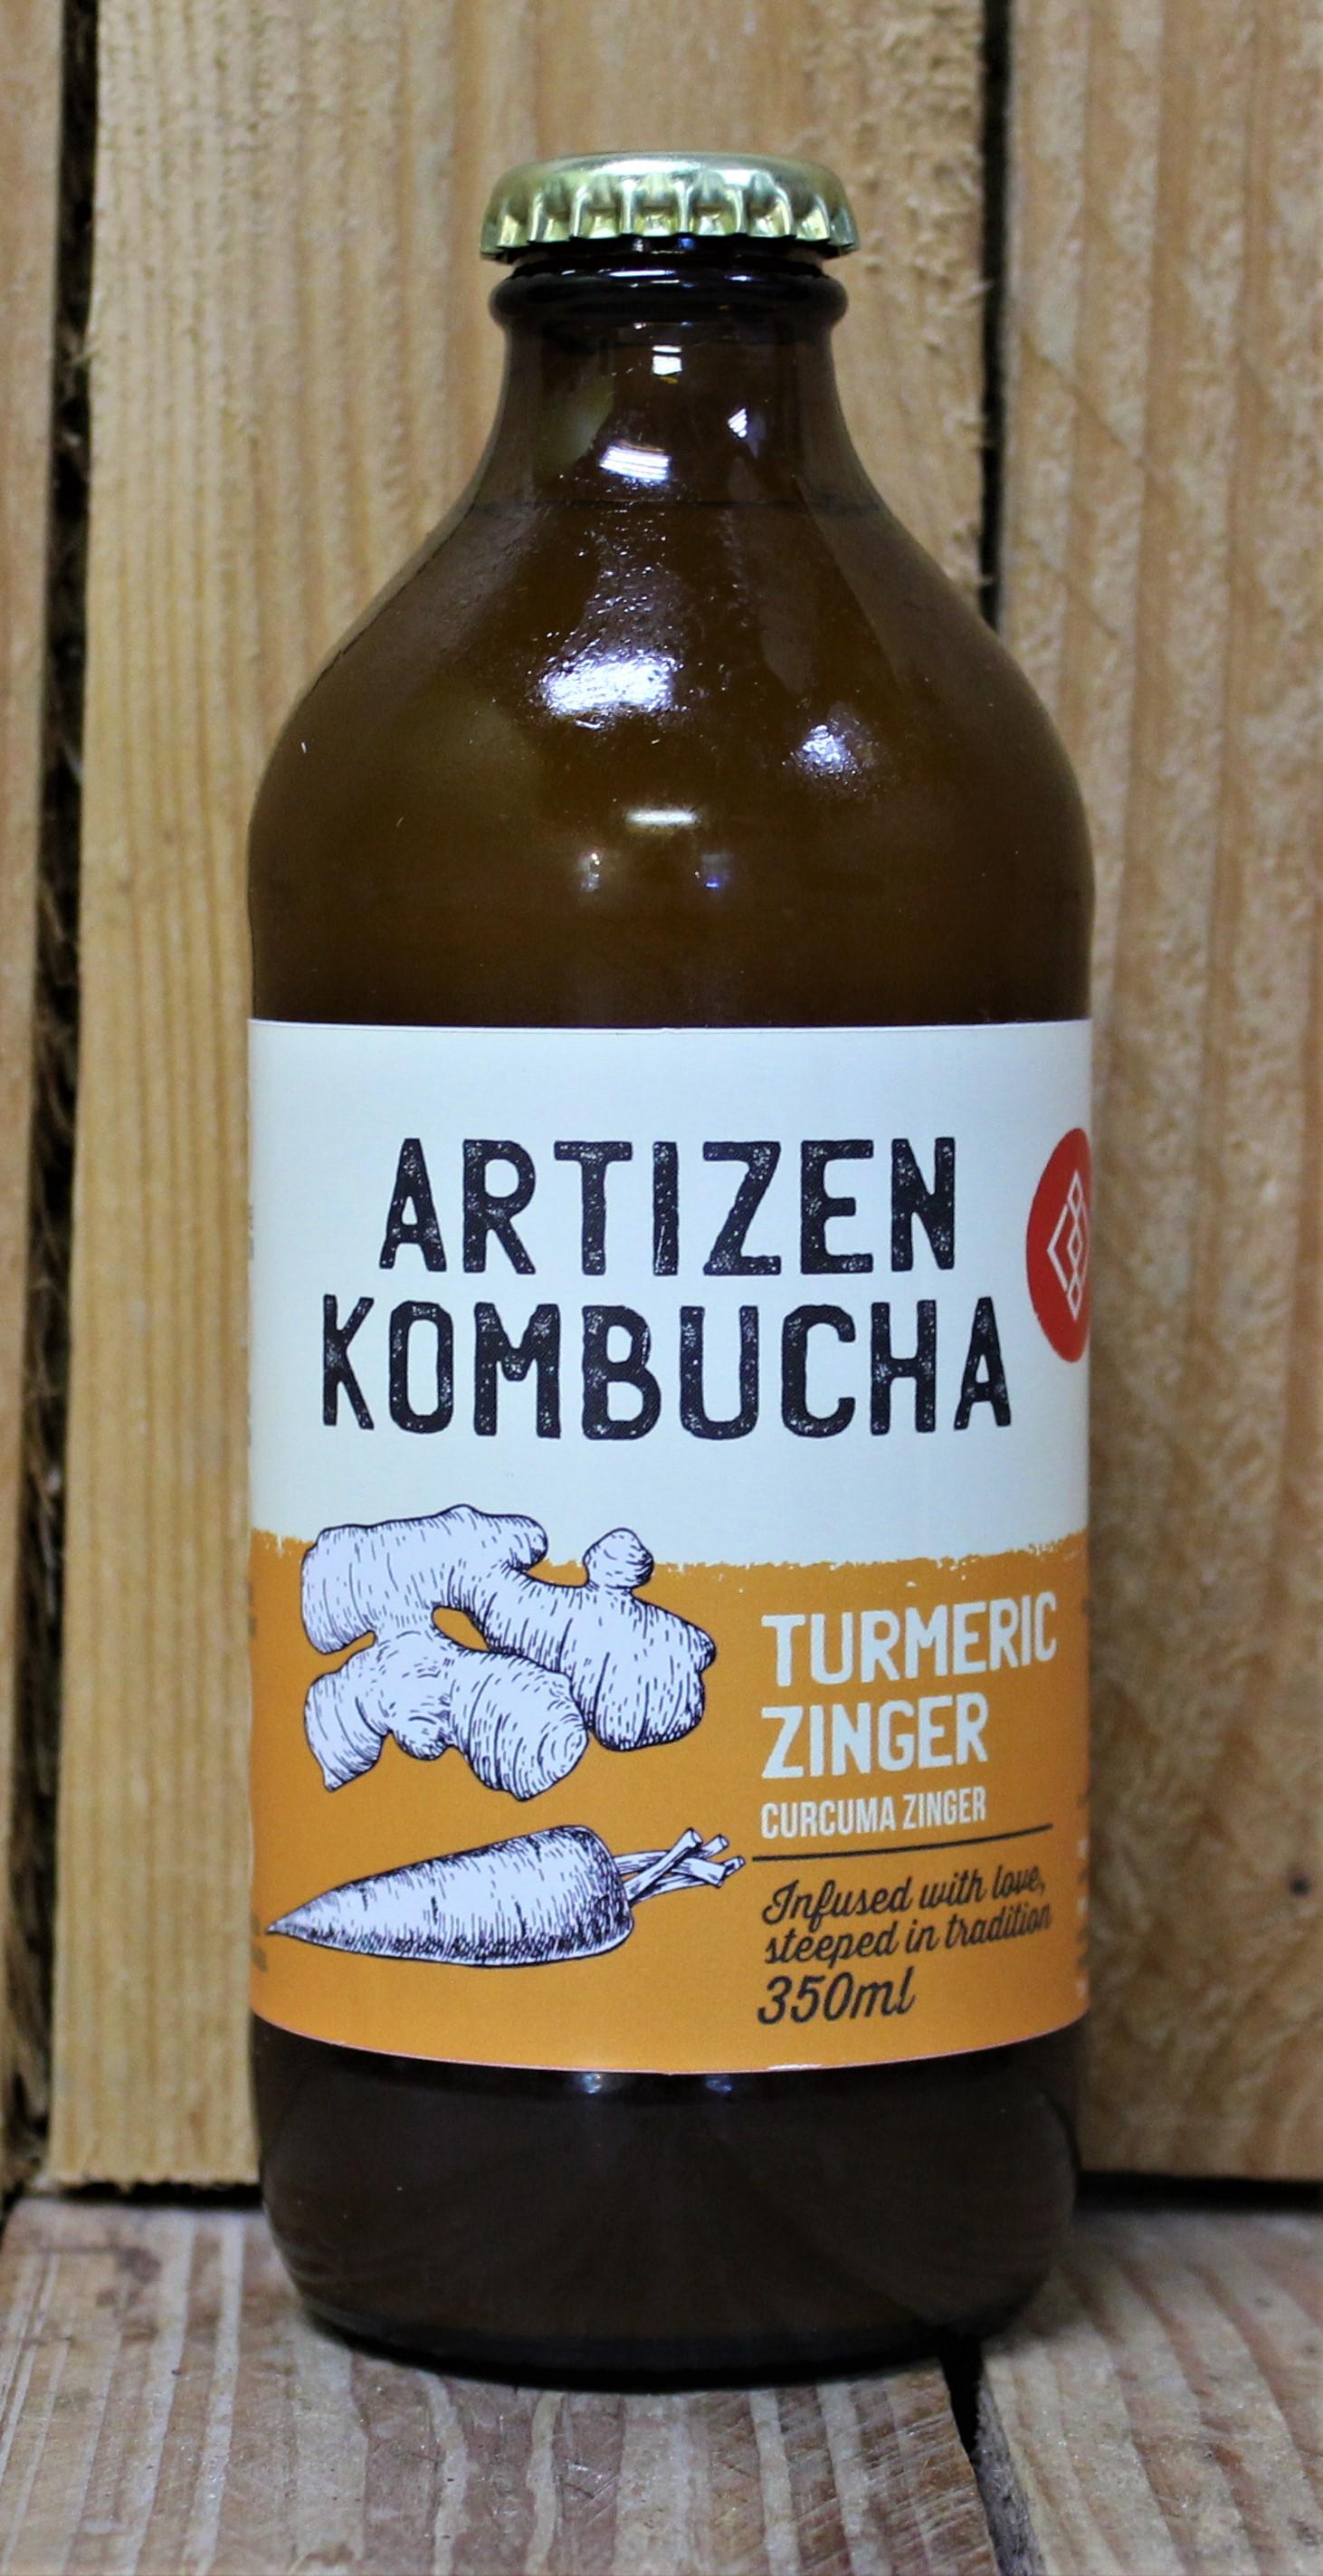 Artizen Kombucha – Turmeric Zinger (4 Bottles x 350ml)